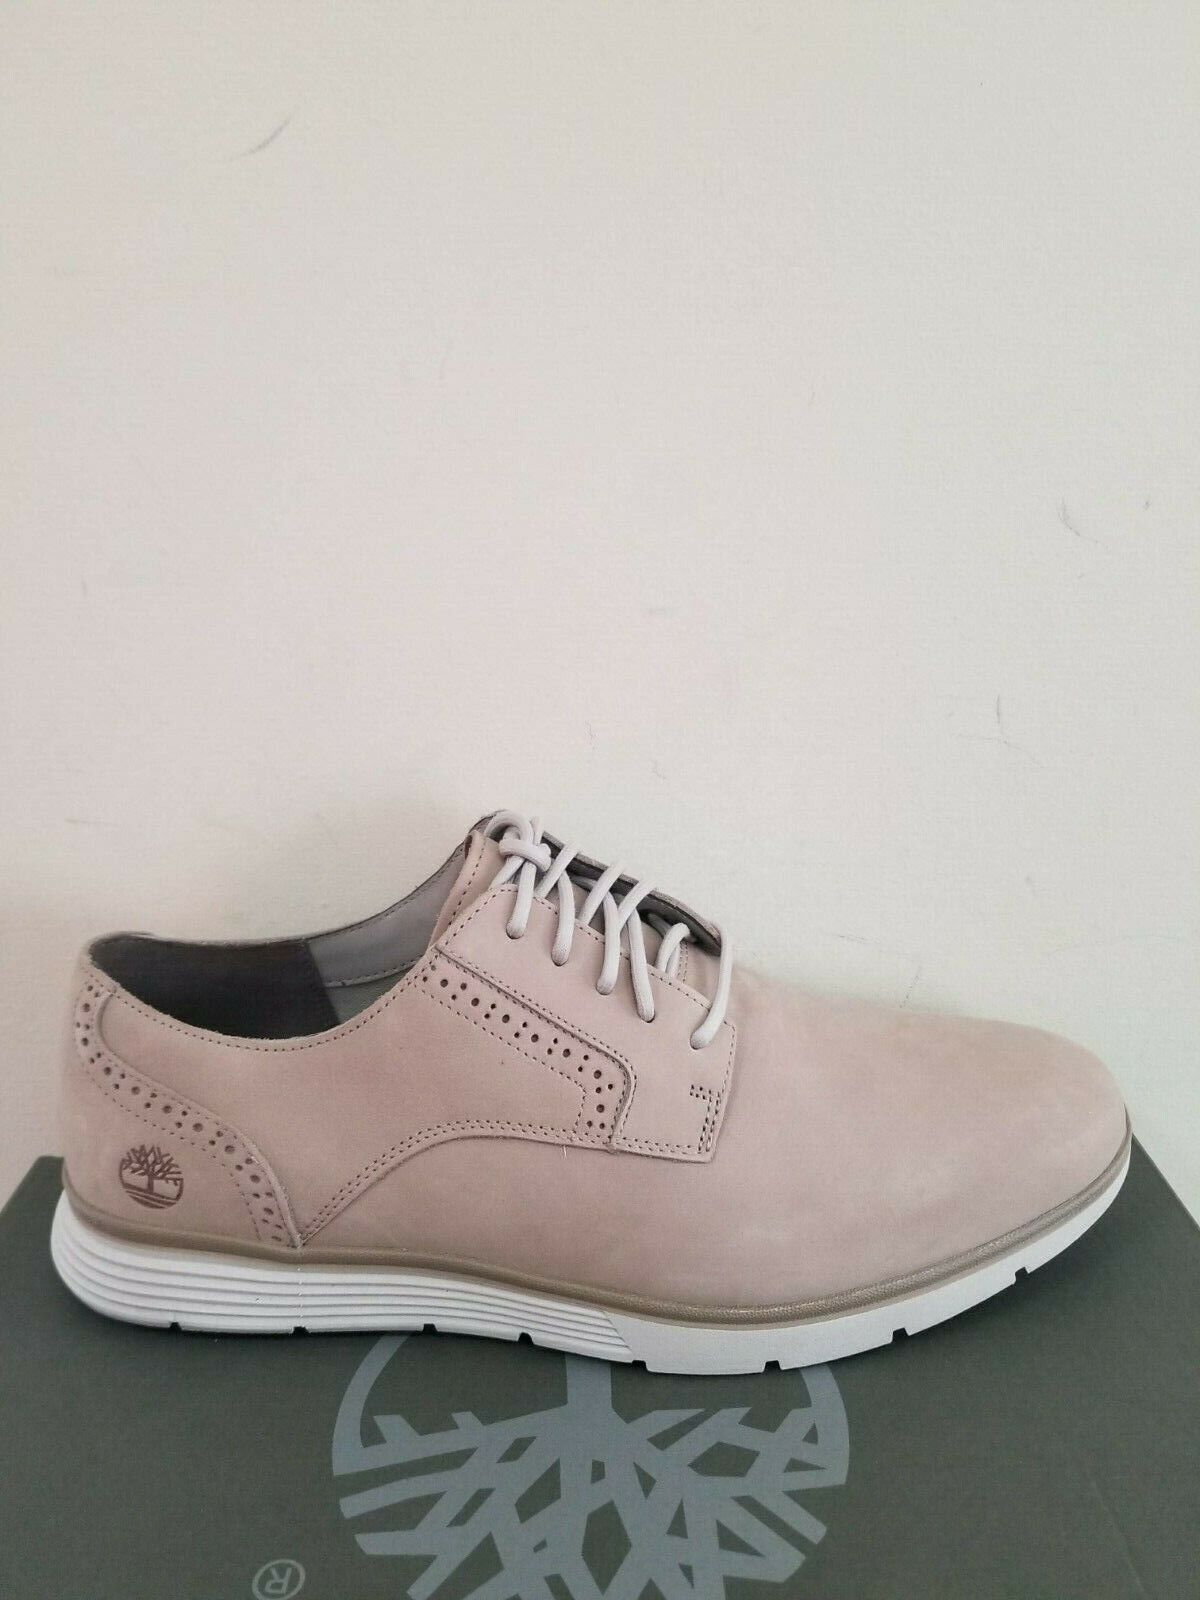 Timberland Men's  Franklin  Park Brogue Oxford Shoes NIB